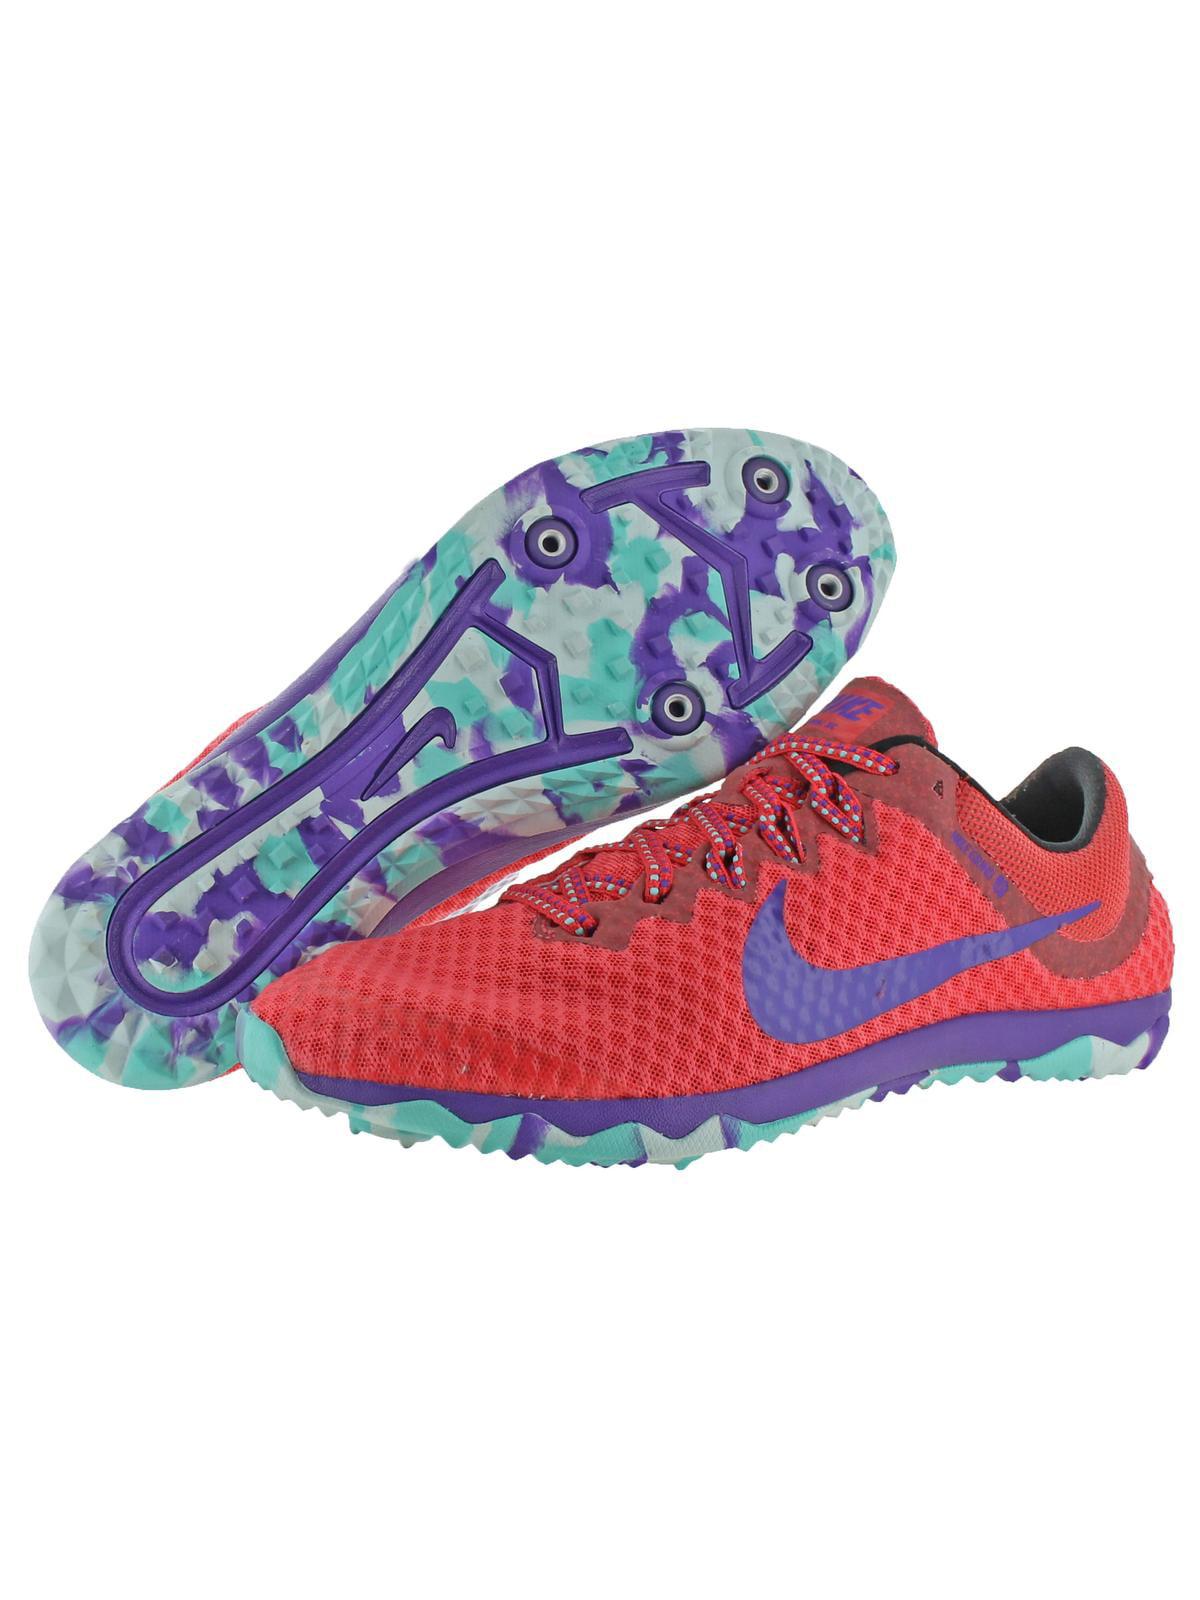 Nike Womens Rival XC Lightweight Athletic Running Shoes Pink 8 Medium (B,M)